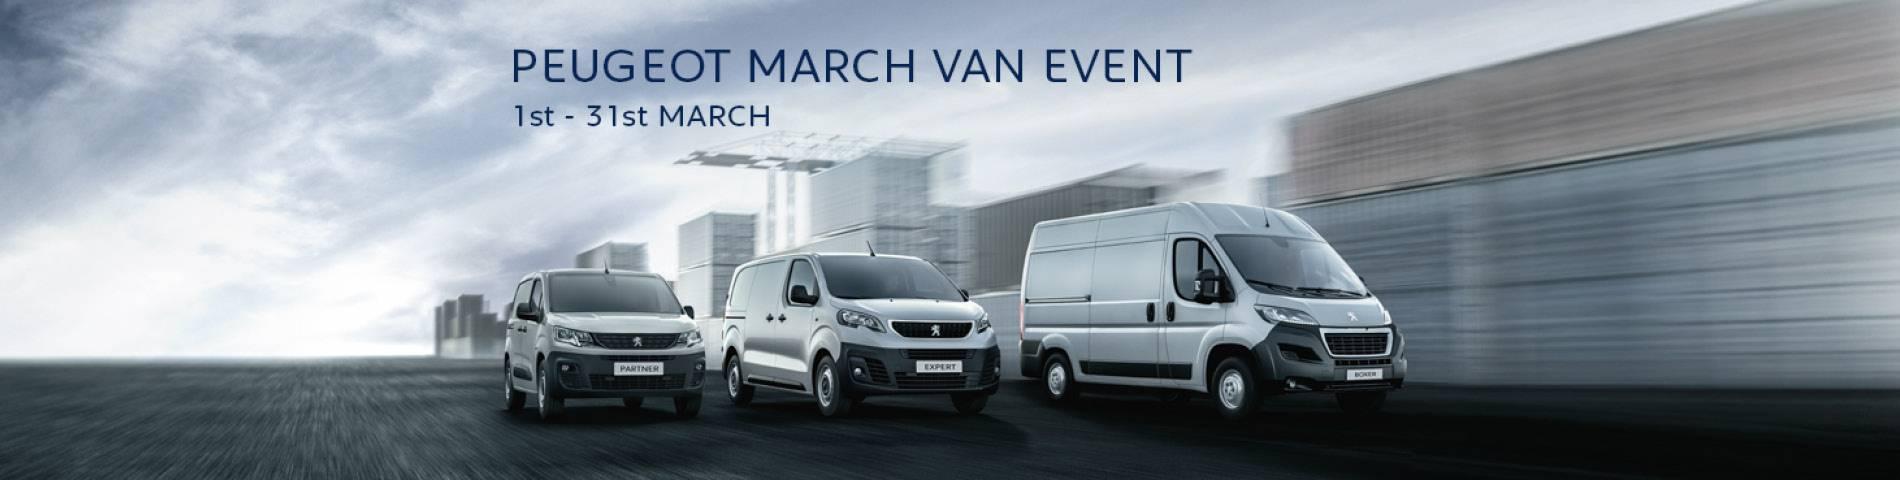 Peugeot March Van Event